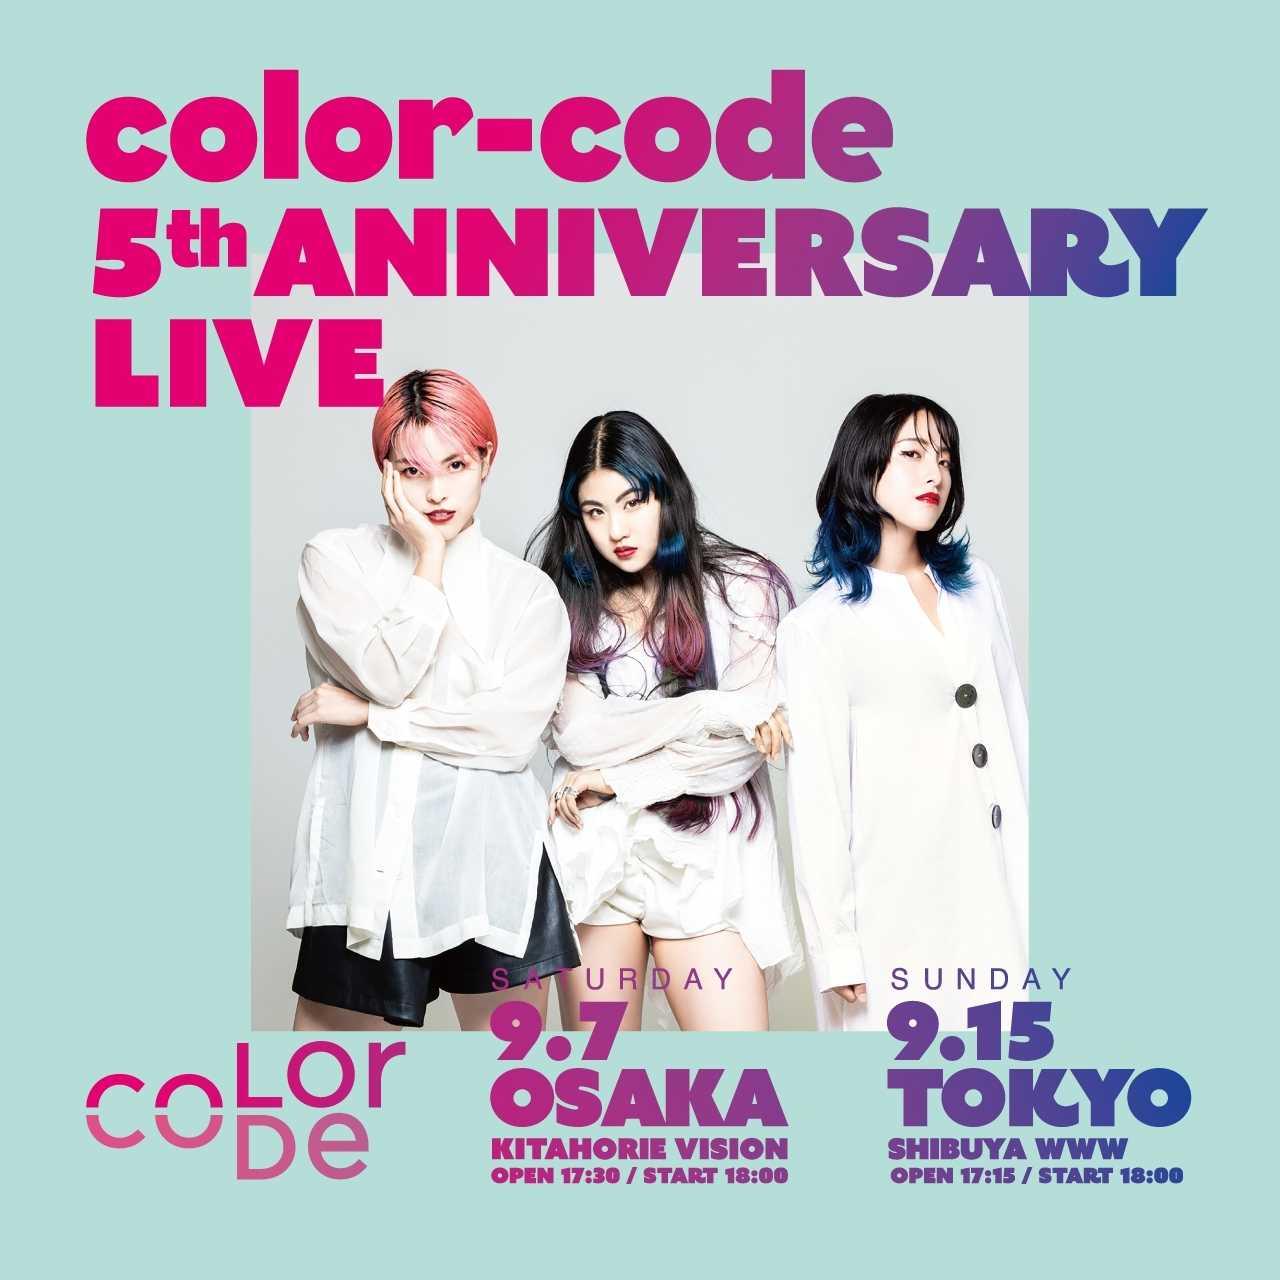 『color-code 5th Anniversary LIVE』